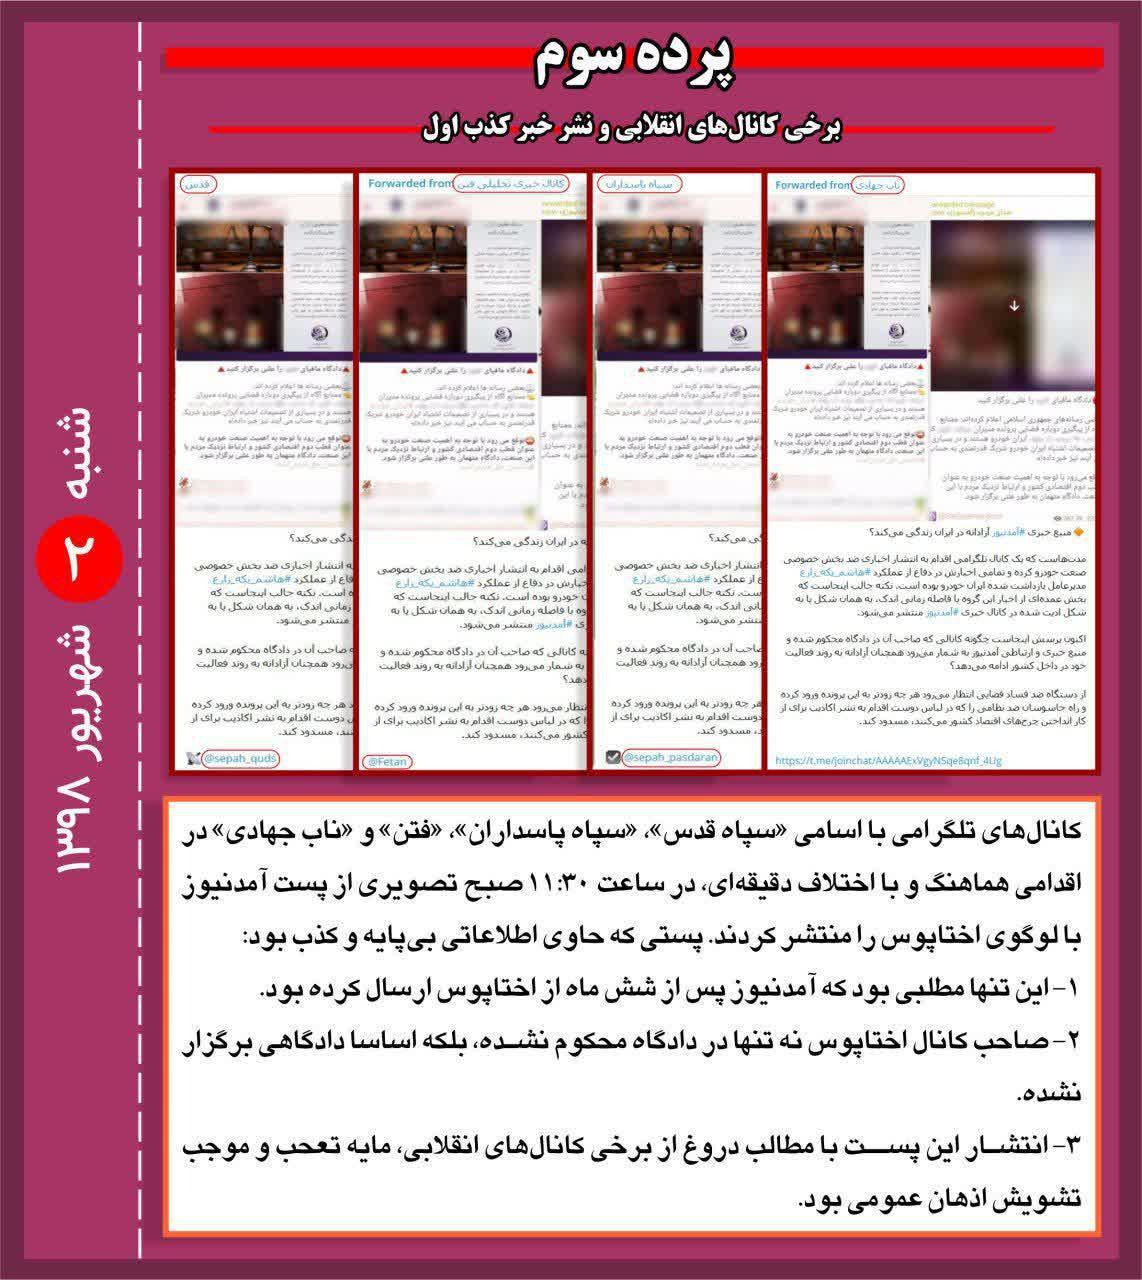 http://dl-abbasi.ir/yekta/1398/Graphic/RMT/3.jpg